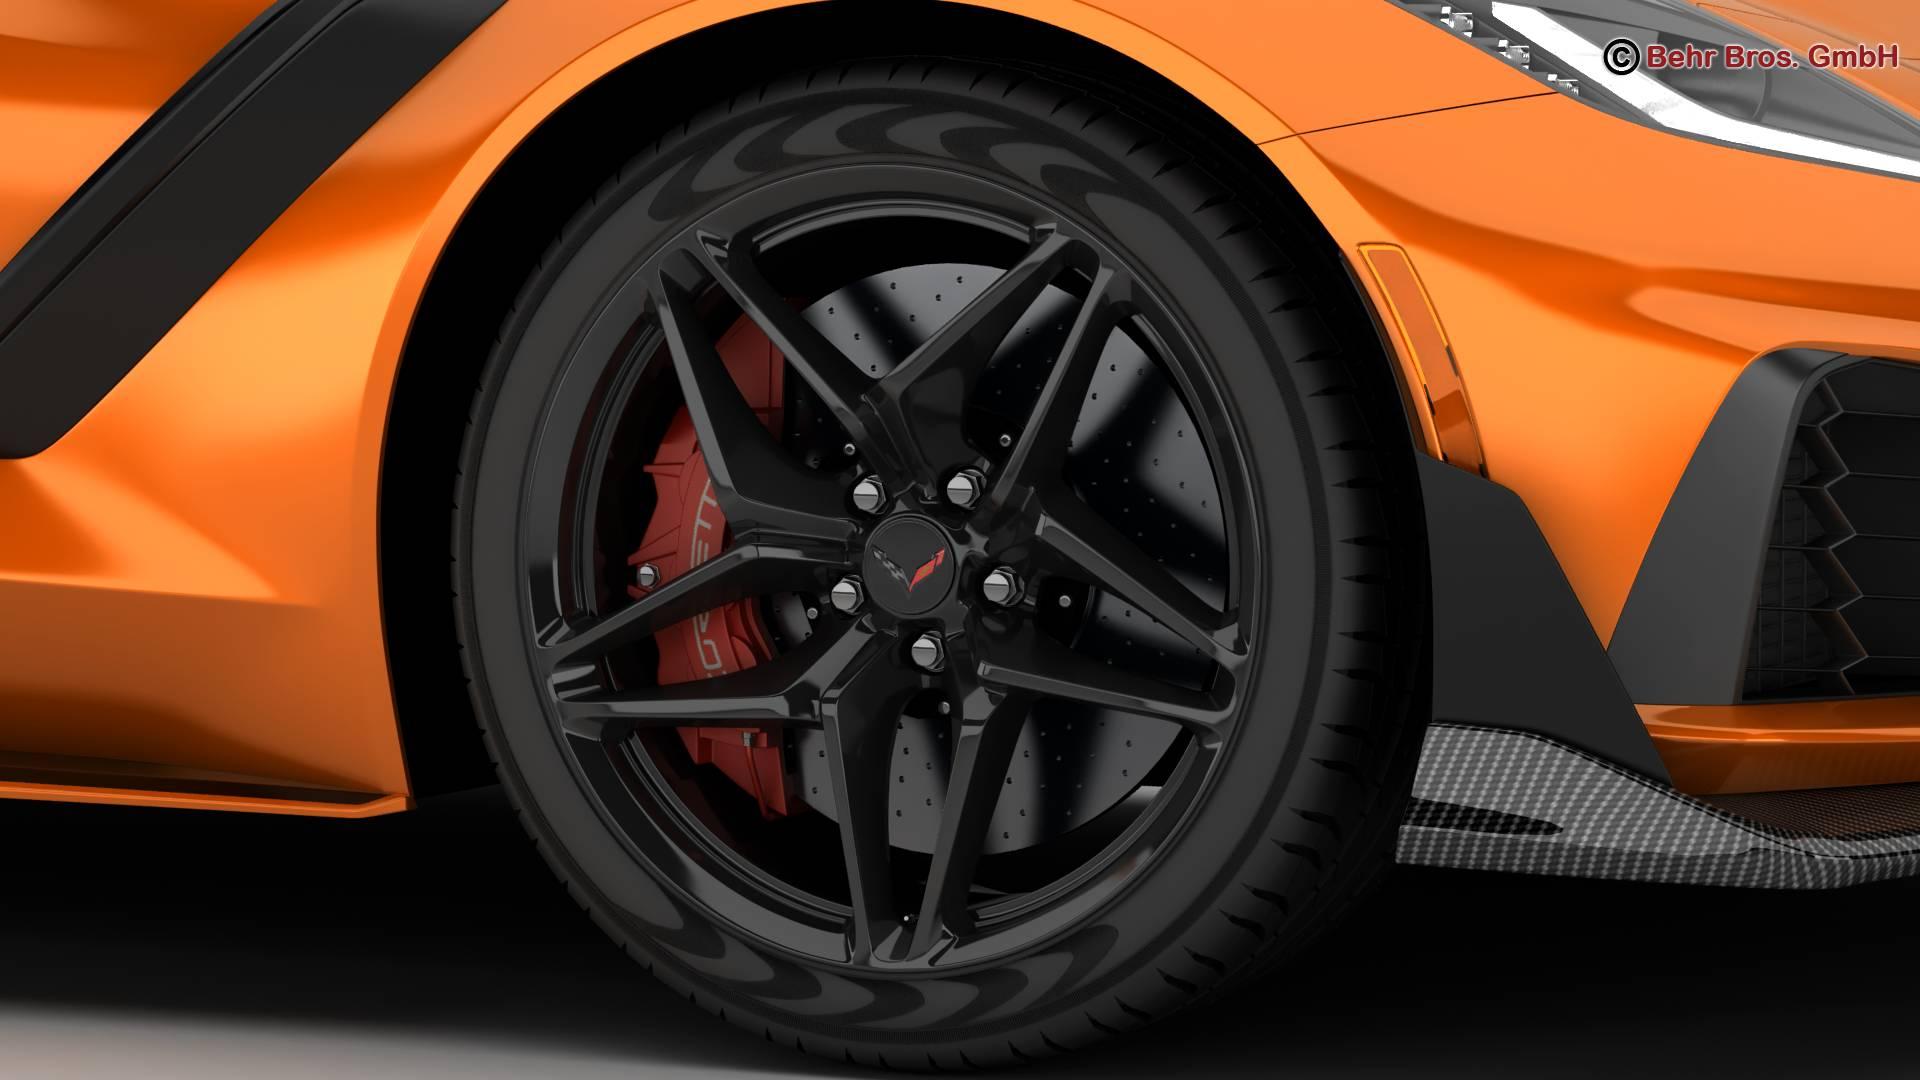 chevrolet corvette zr1 2019 3d model 3ds max fbx c4d lwo ma mb obj 275974